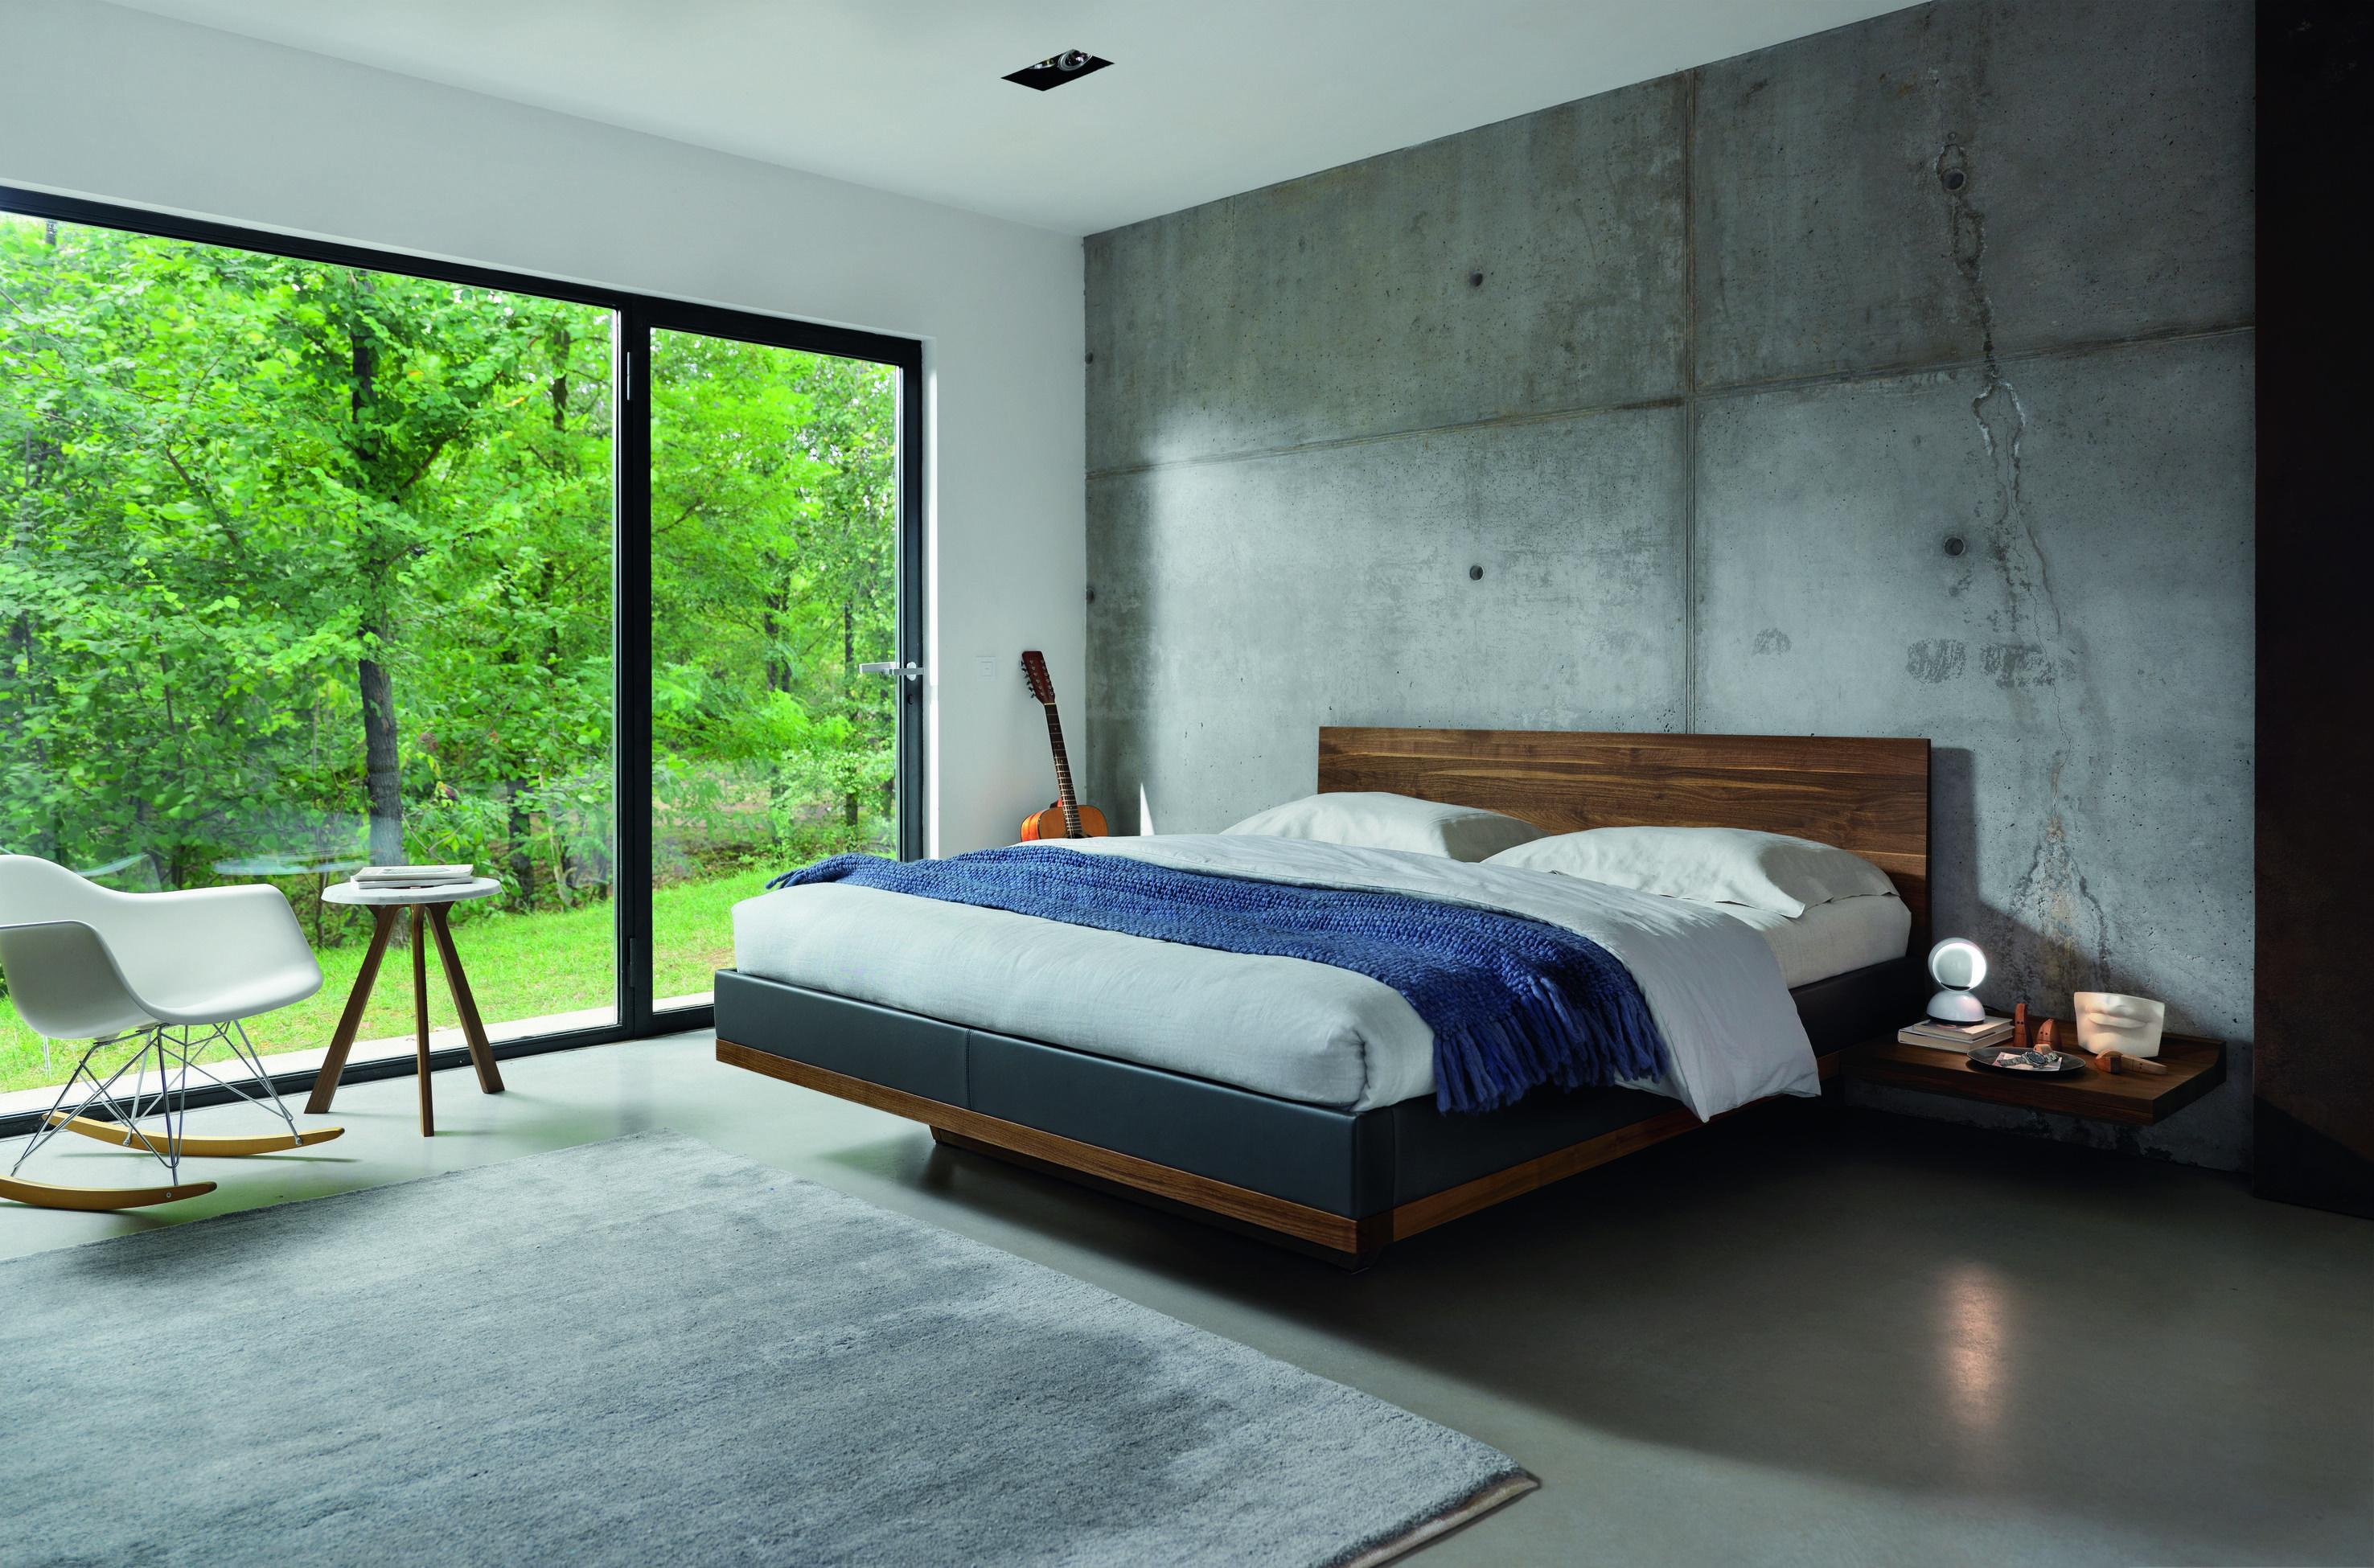 3 MODERN EUROPEAN BEDS WE CANu0027T LIVE